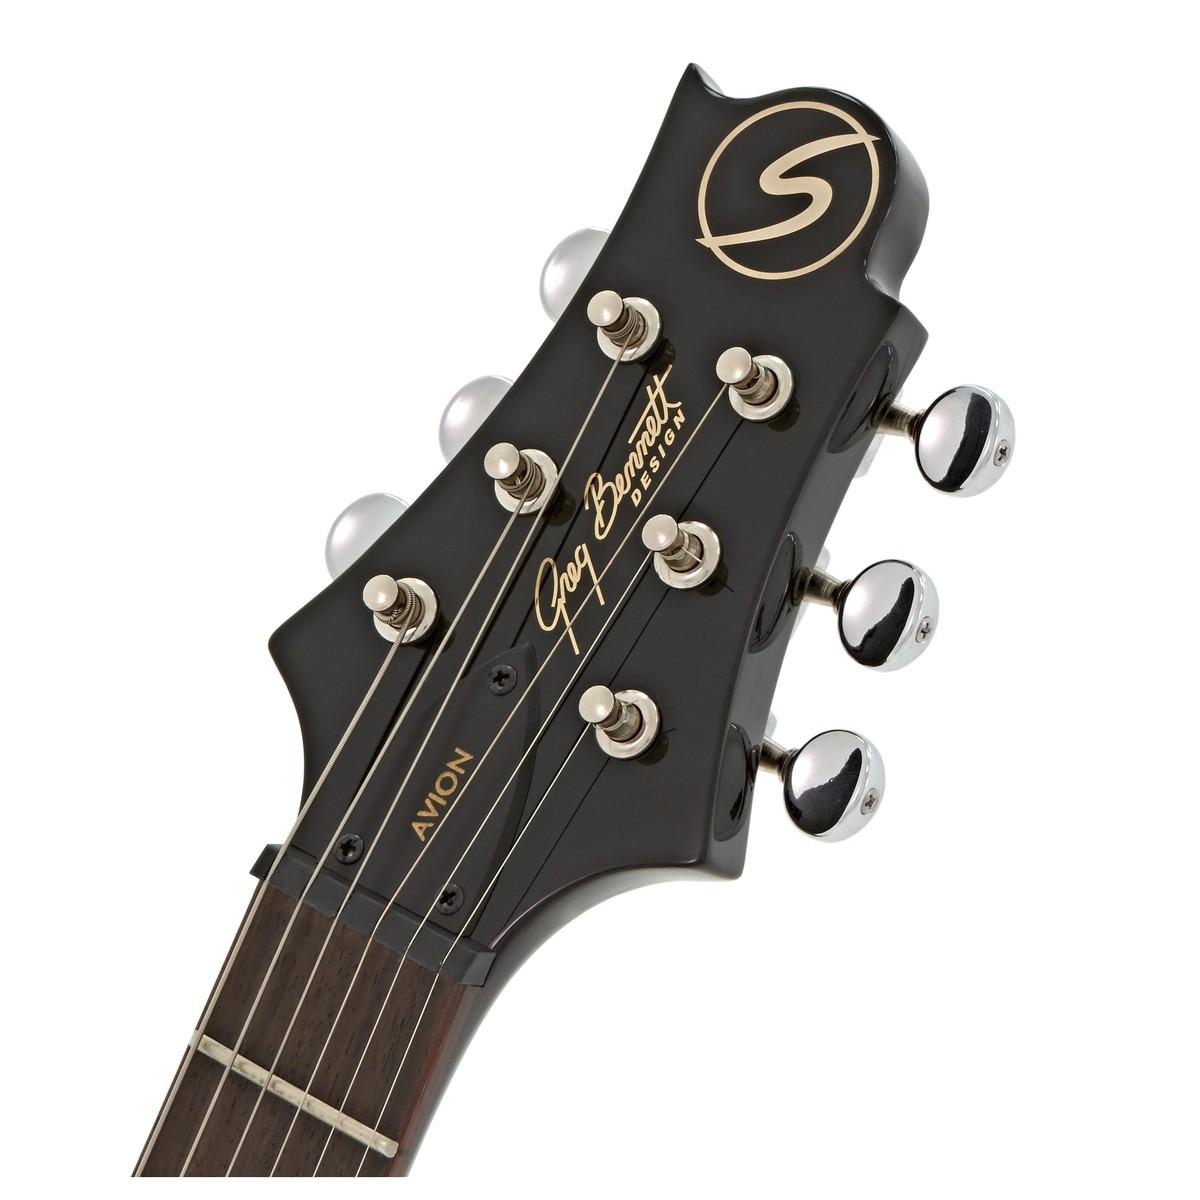 greg bennett avion mav 1 mini electric guitar black at gear4music. Black Bedroom Furniture Sets. Home Design Ideas